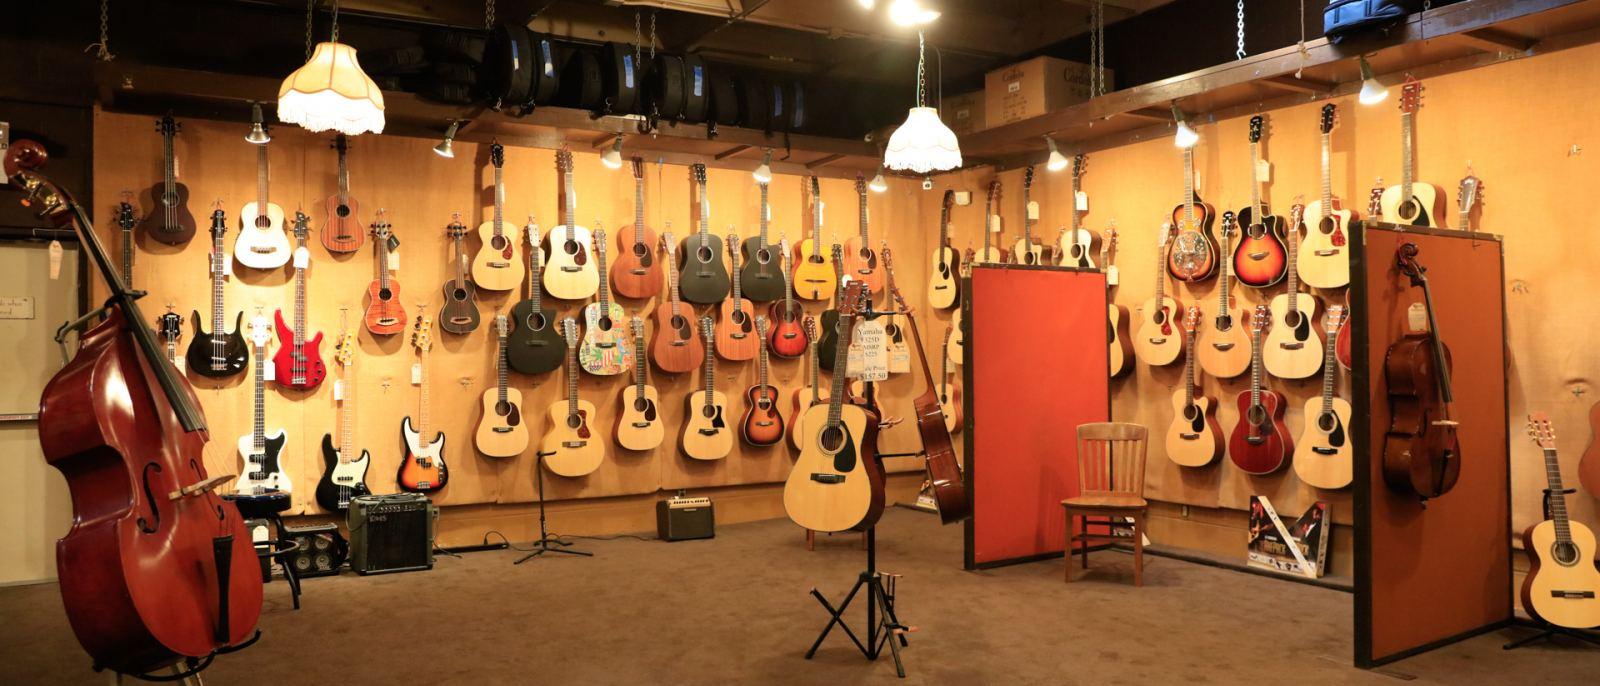 McCabe's Guitar Shop in Santa Monica